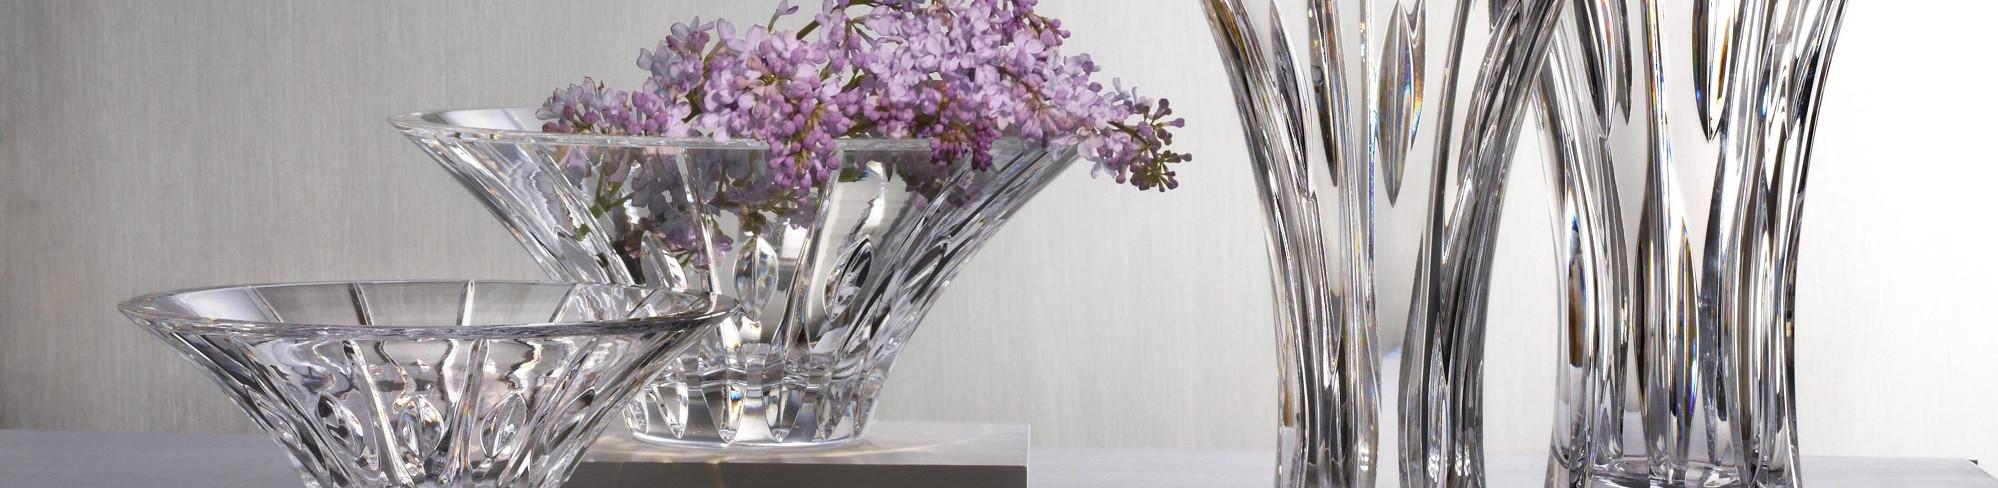 Rogaska Crystal Vase Patterns Of Marquis by Waterford Stemware Royal Doultona Outlet Royal Inside Stemware